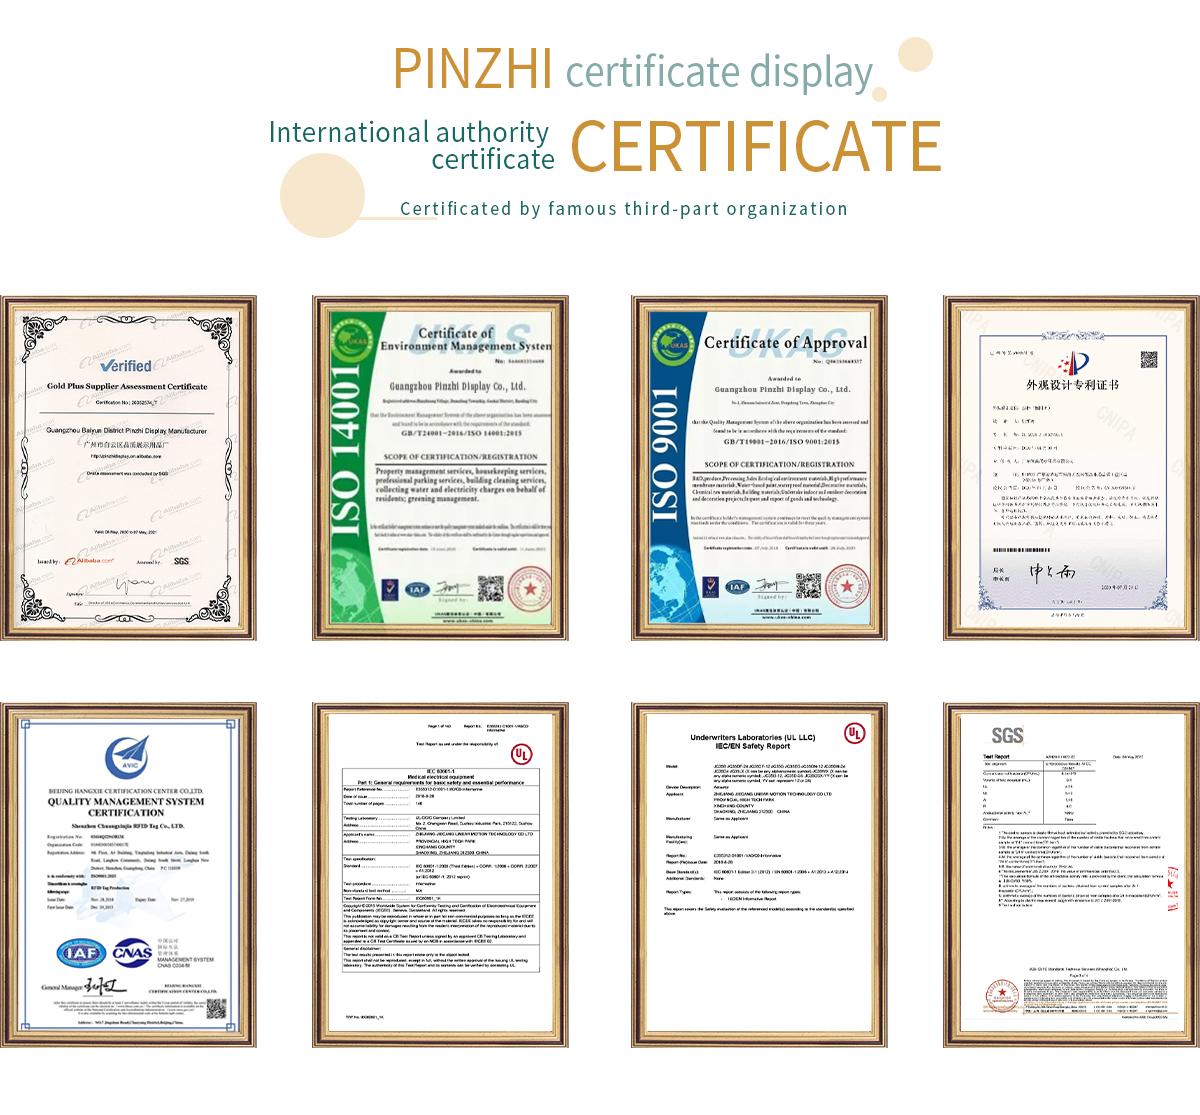 Pinzhi-Authority certificate